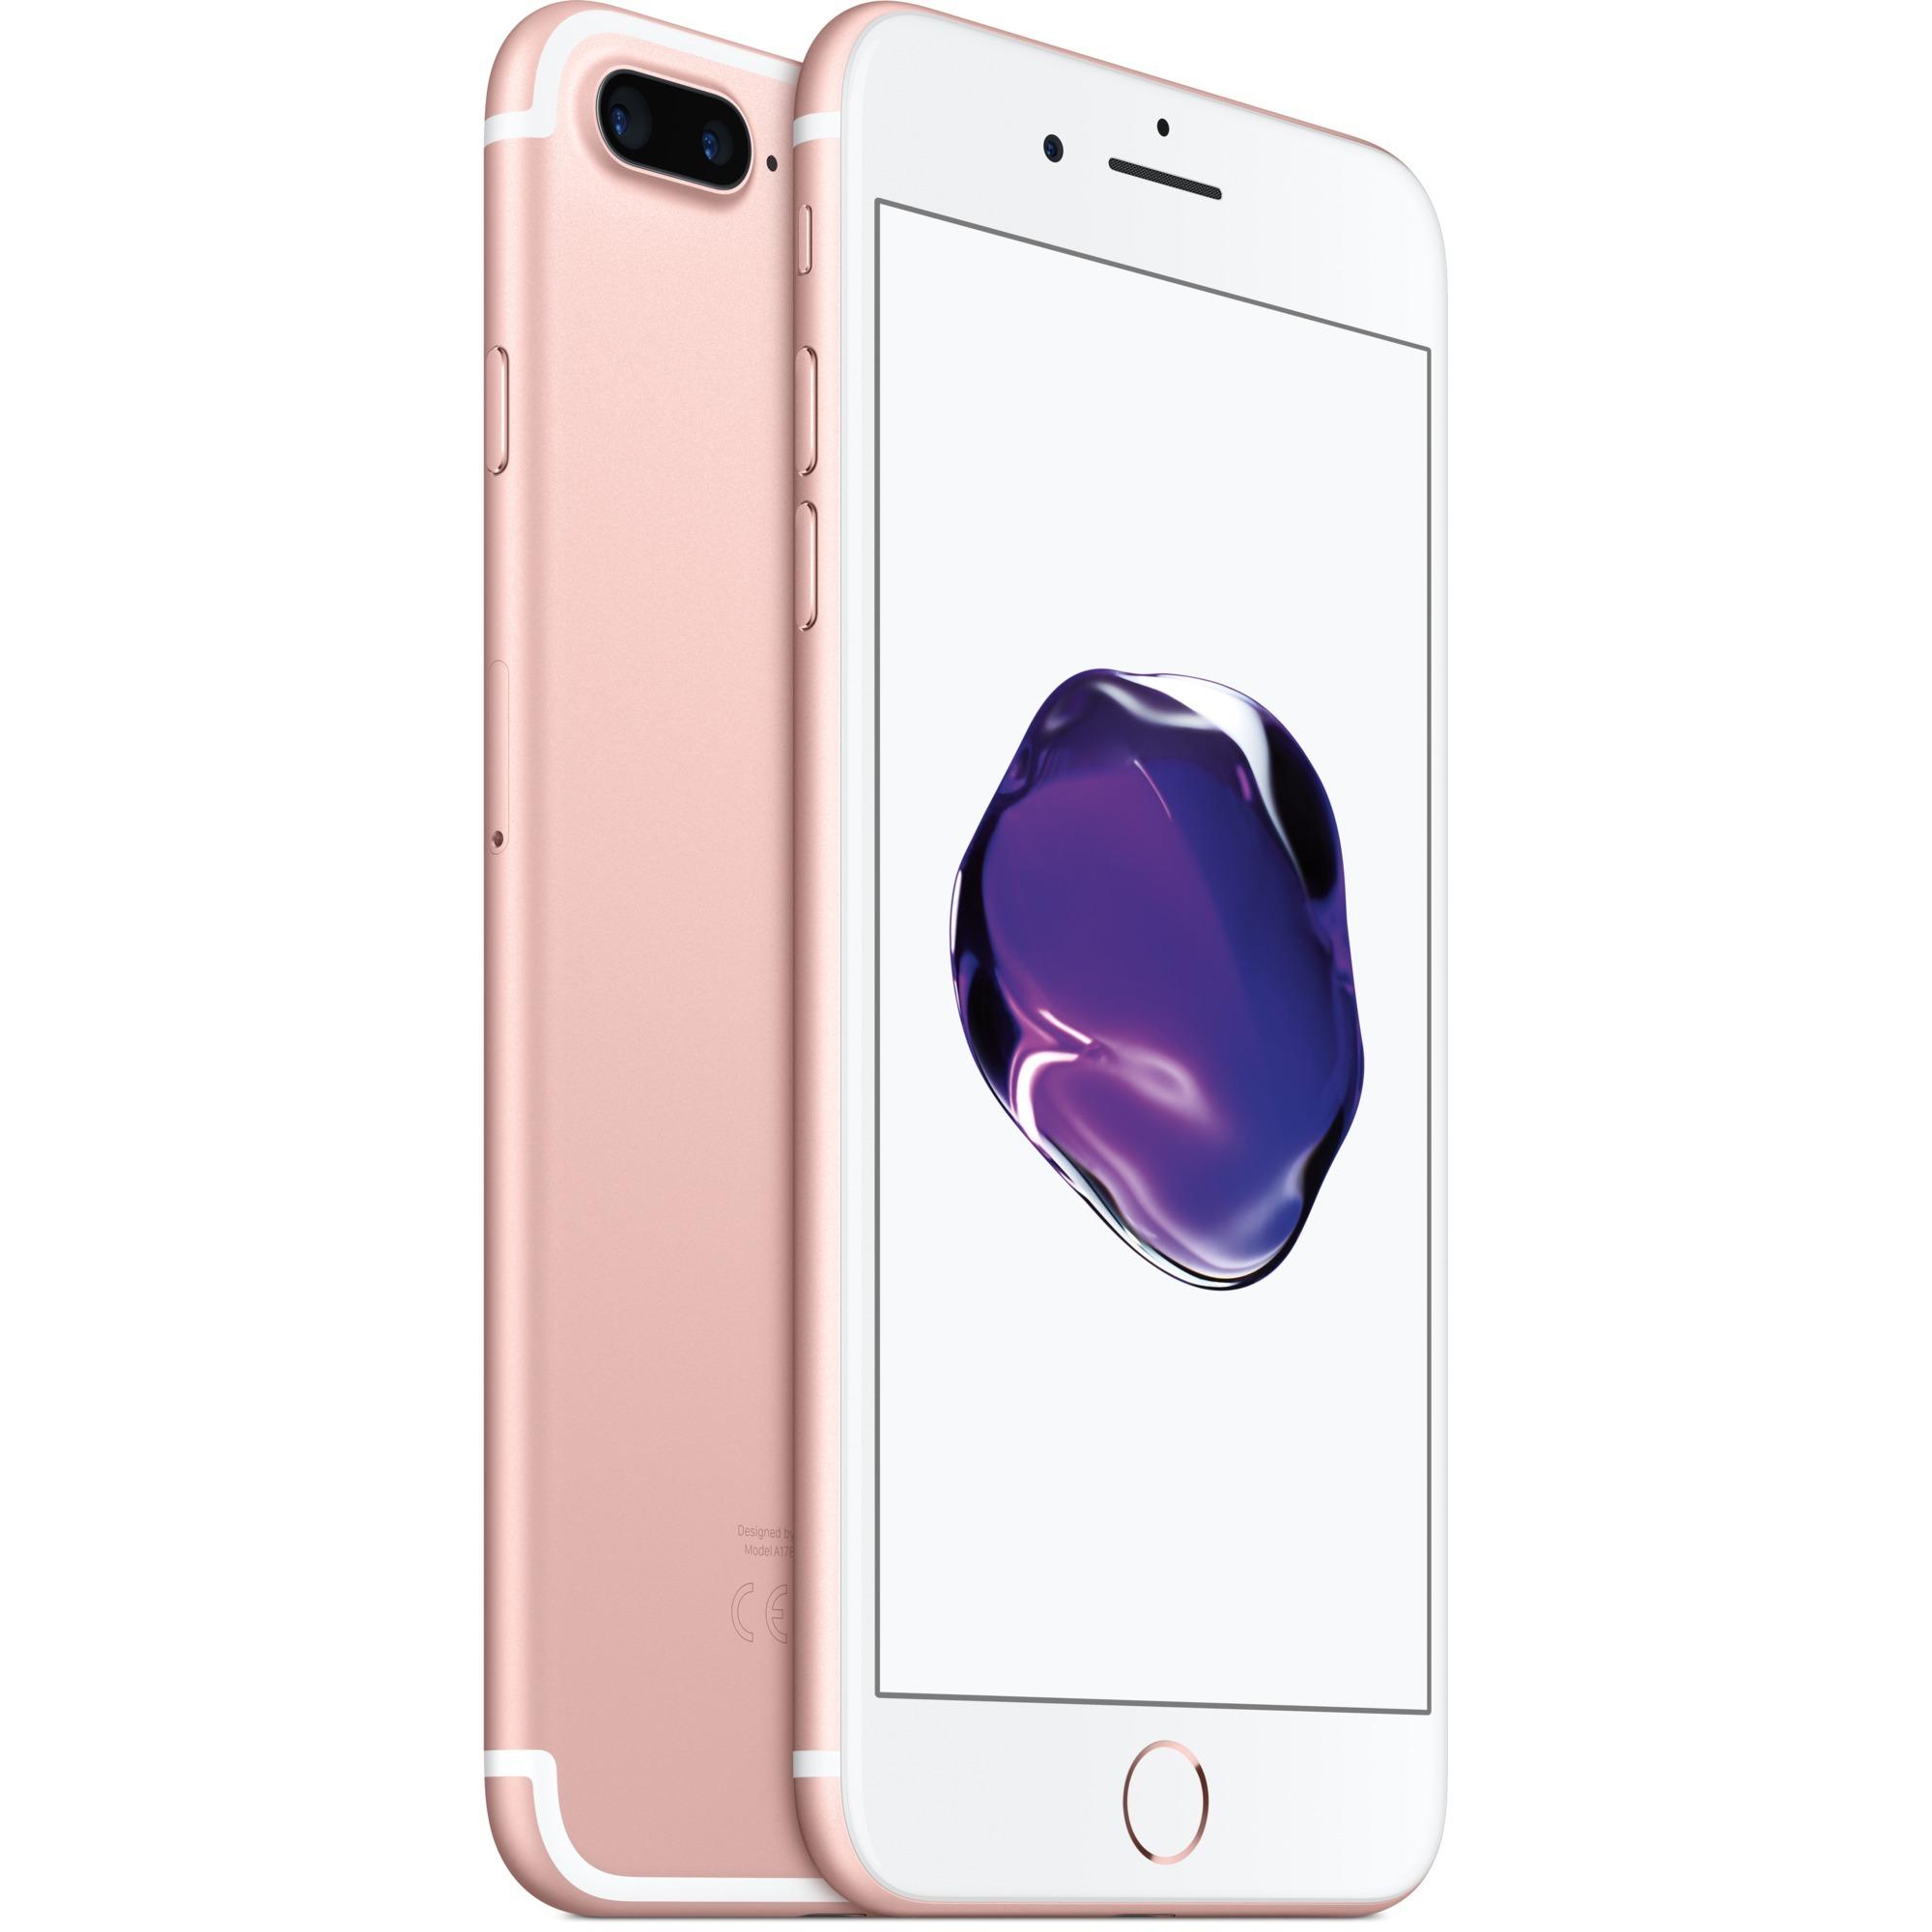 Apple iPhone 7 Plus 256GB, Handy